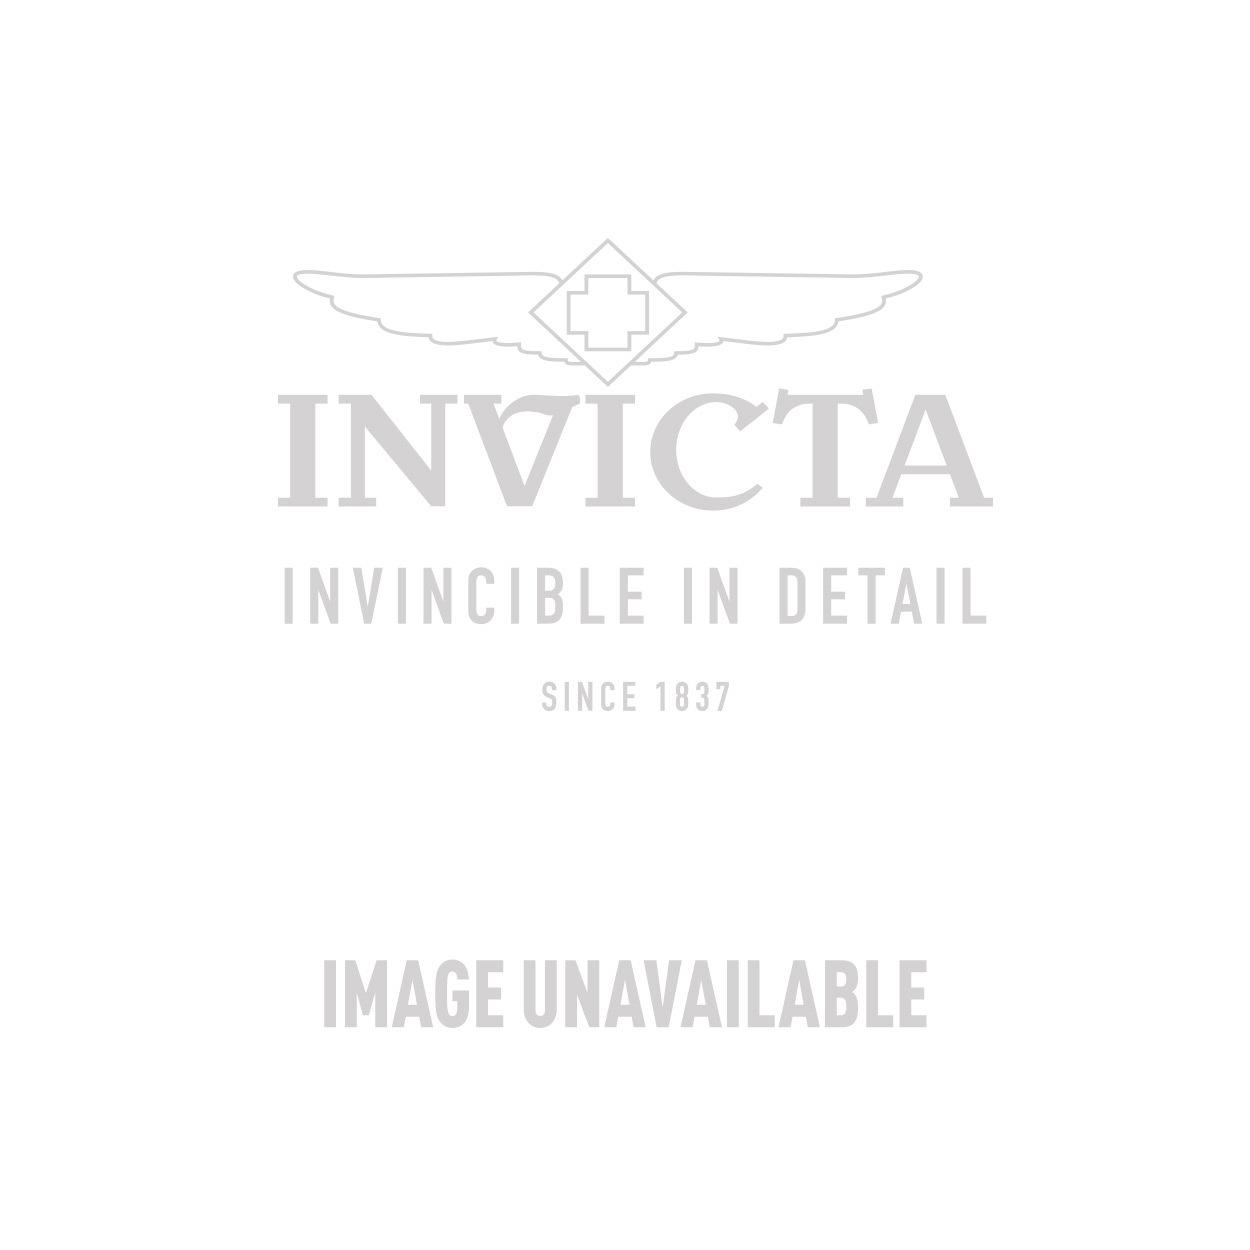 Invicta Pro Diver Automatic Watch - Gunmetal case with Black, Blue tone Silicone band - Model 20204